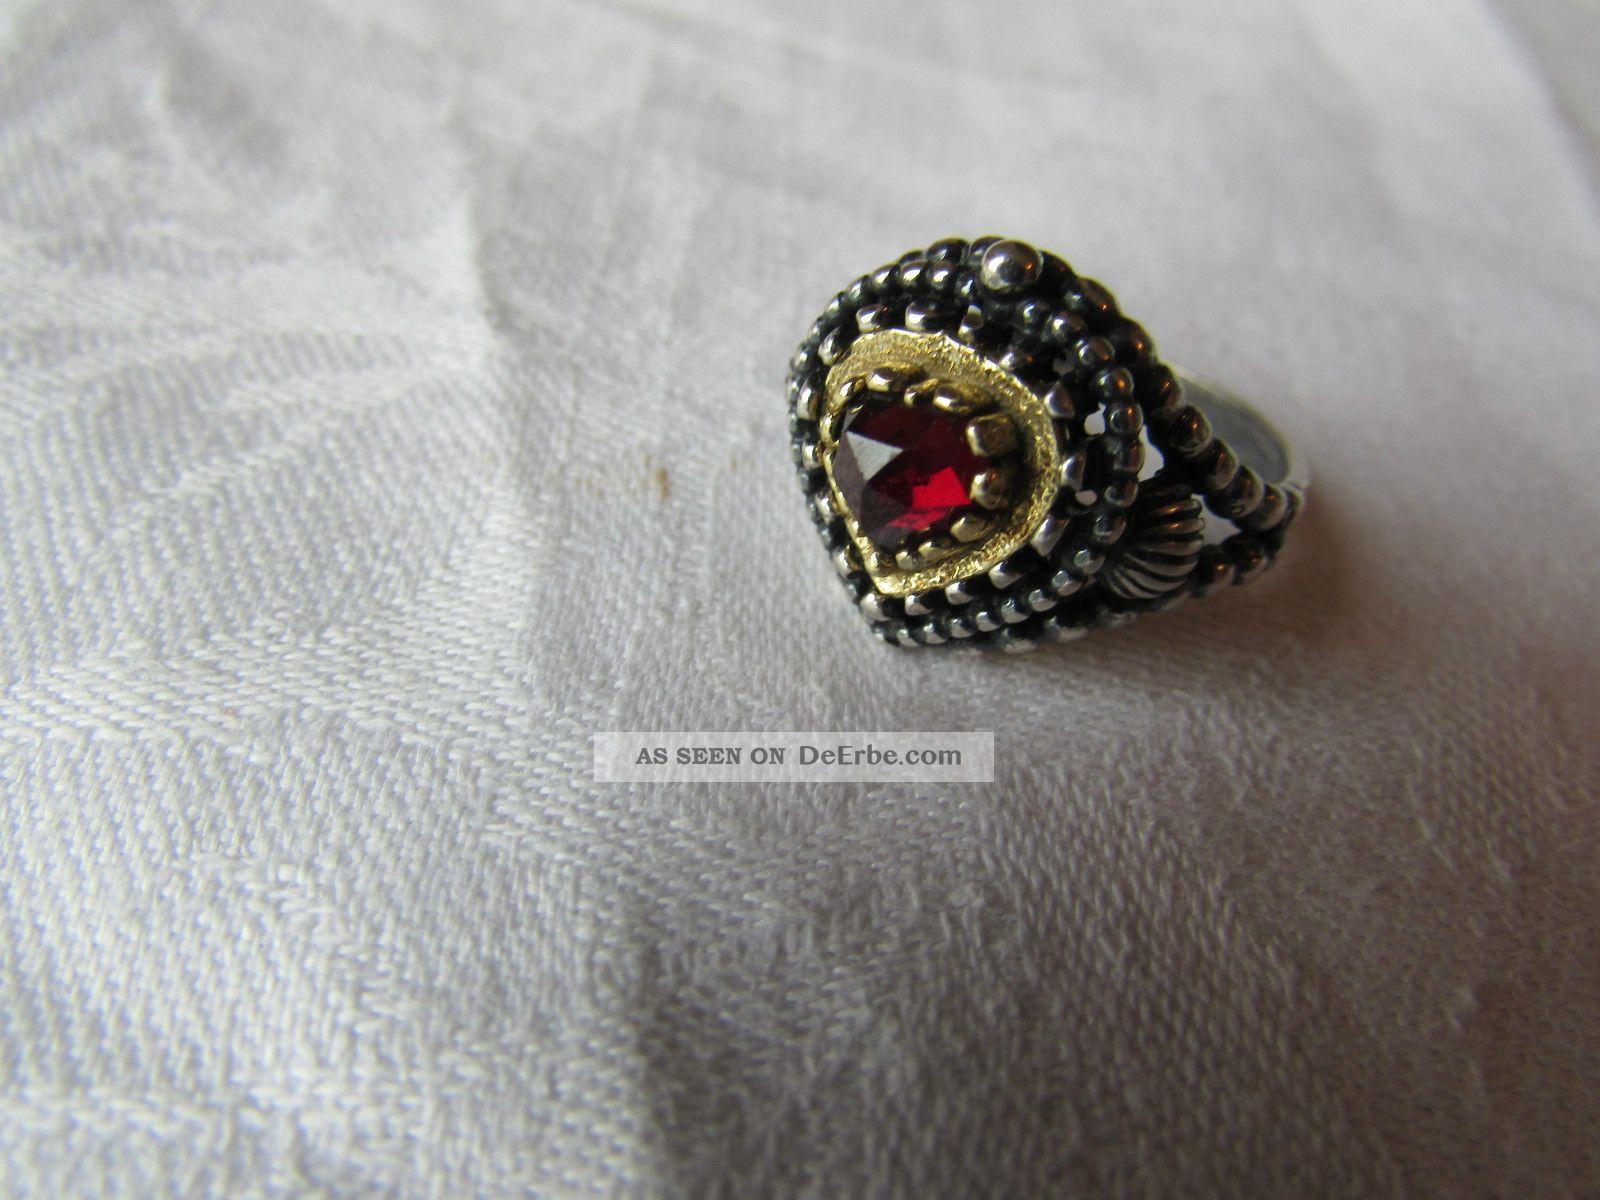 Alter Ring Silber 835 Granat Silberring Trachtenschmuck Antik Nachla